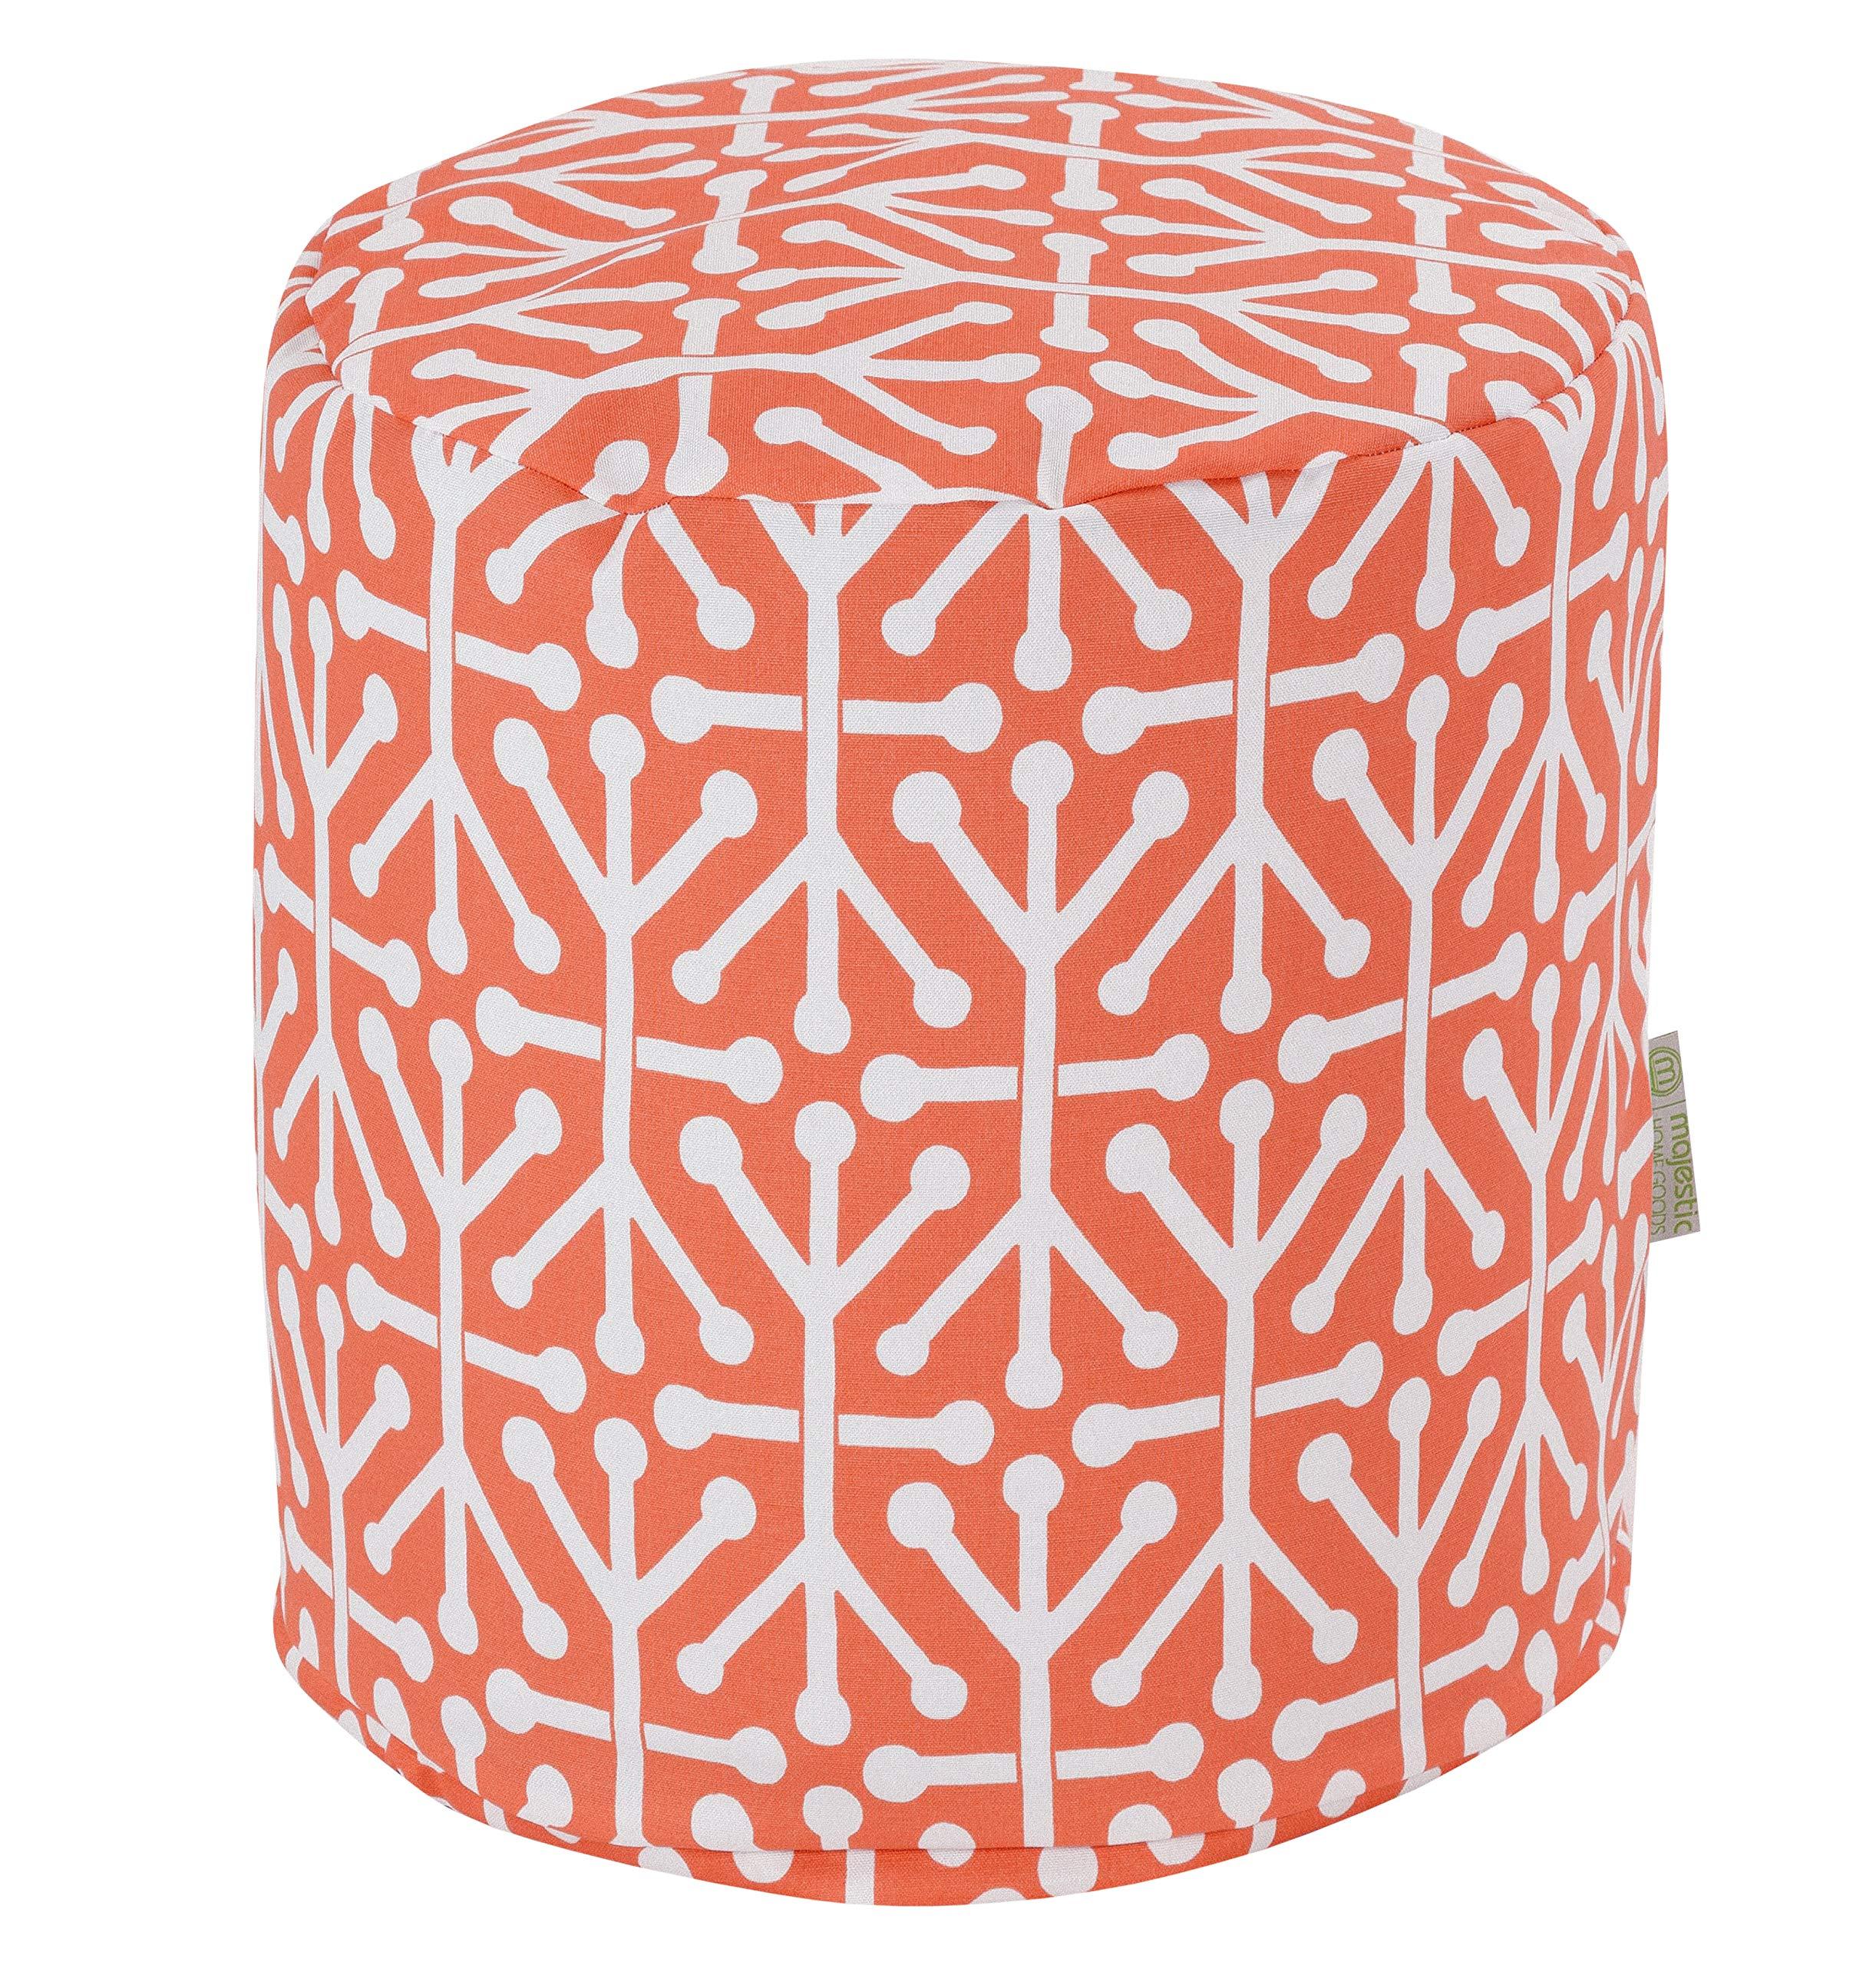 Majestic Home Goods Orange Aruba Indoor/Outdoor Bean Bag Ottoman Pouf 16'' L x 16'' W x 17'' H